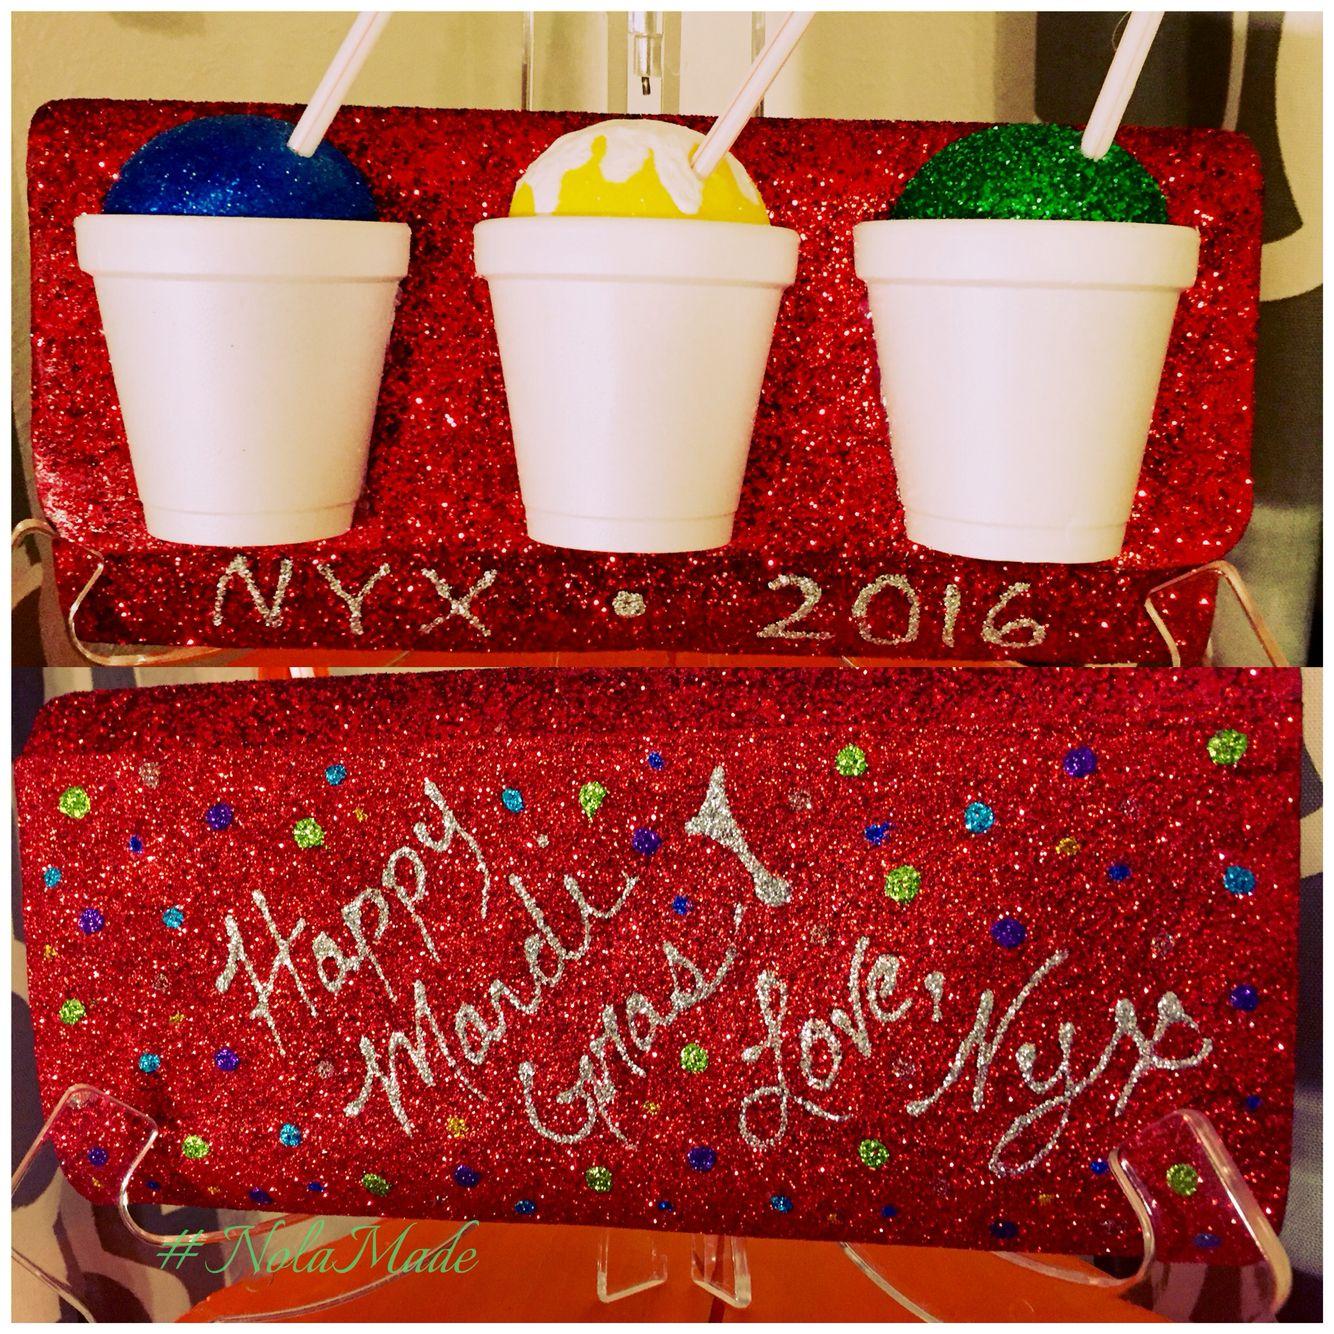 Mystic Krewe Of Nyx My Nyx Purse Creation 2016 Nolamade Float30 Nyxpursetracker Mardi Gras Crafts Purse Decorations Themed Crafts